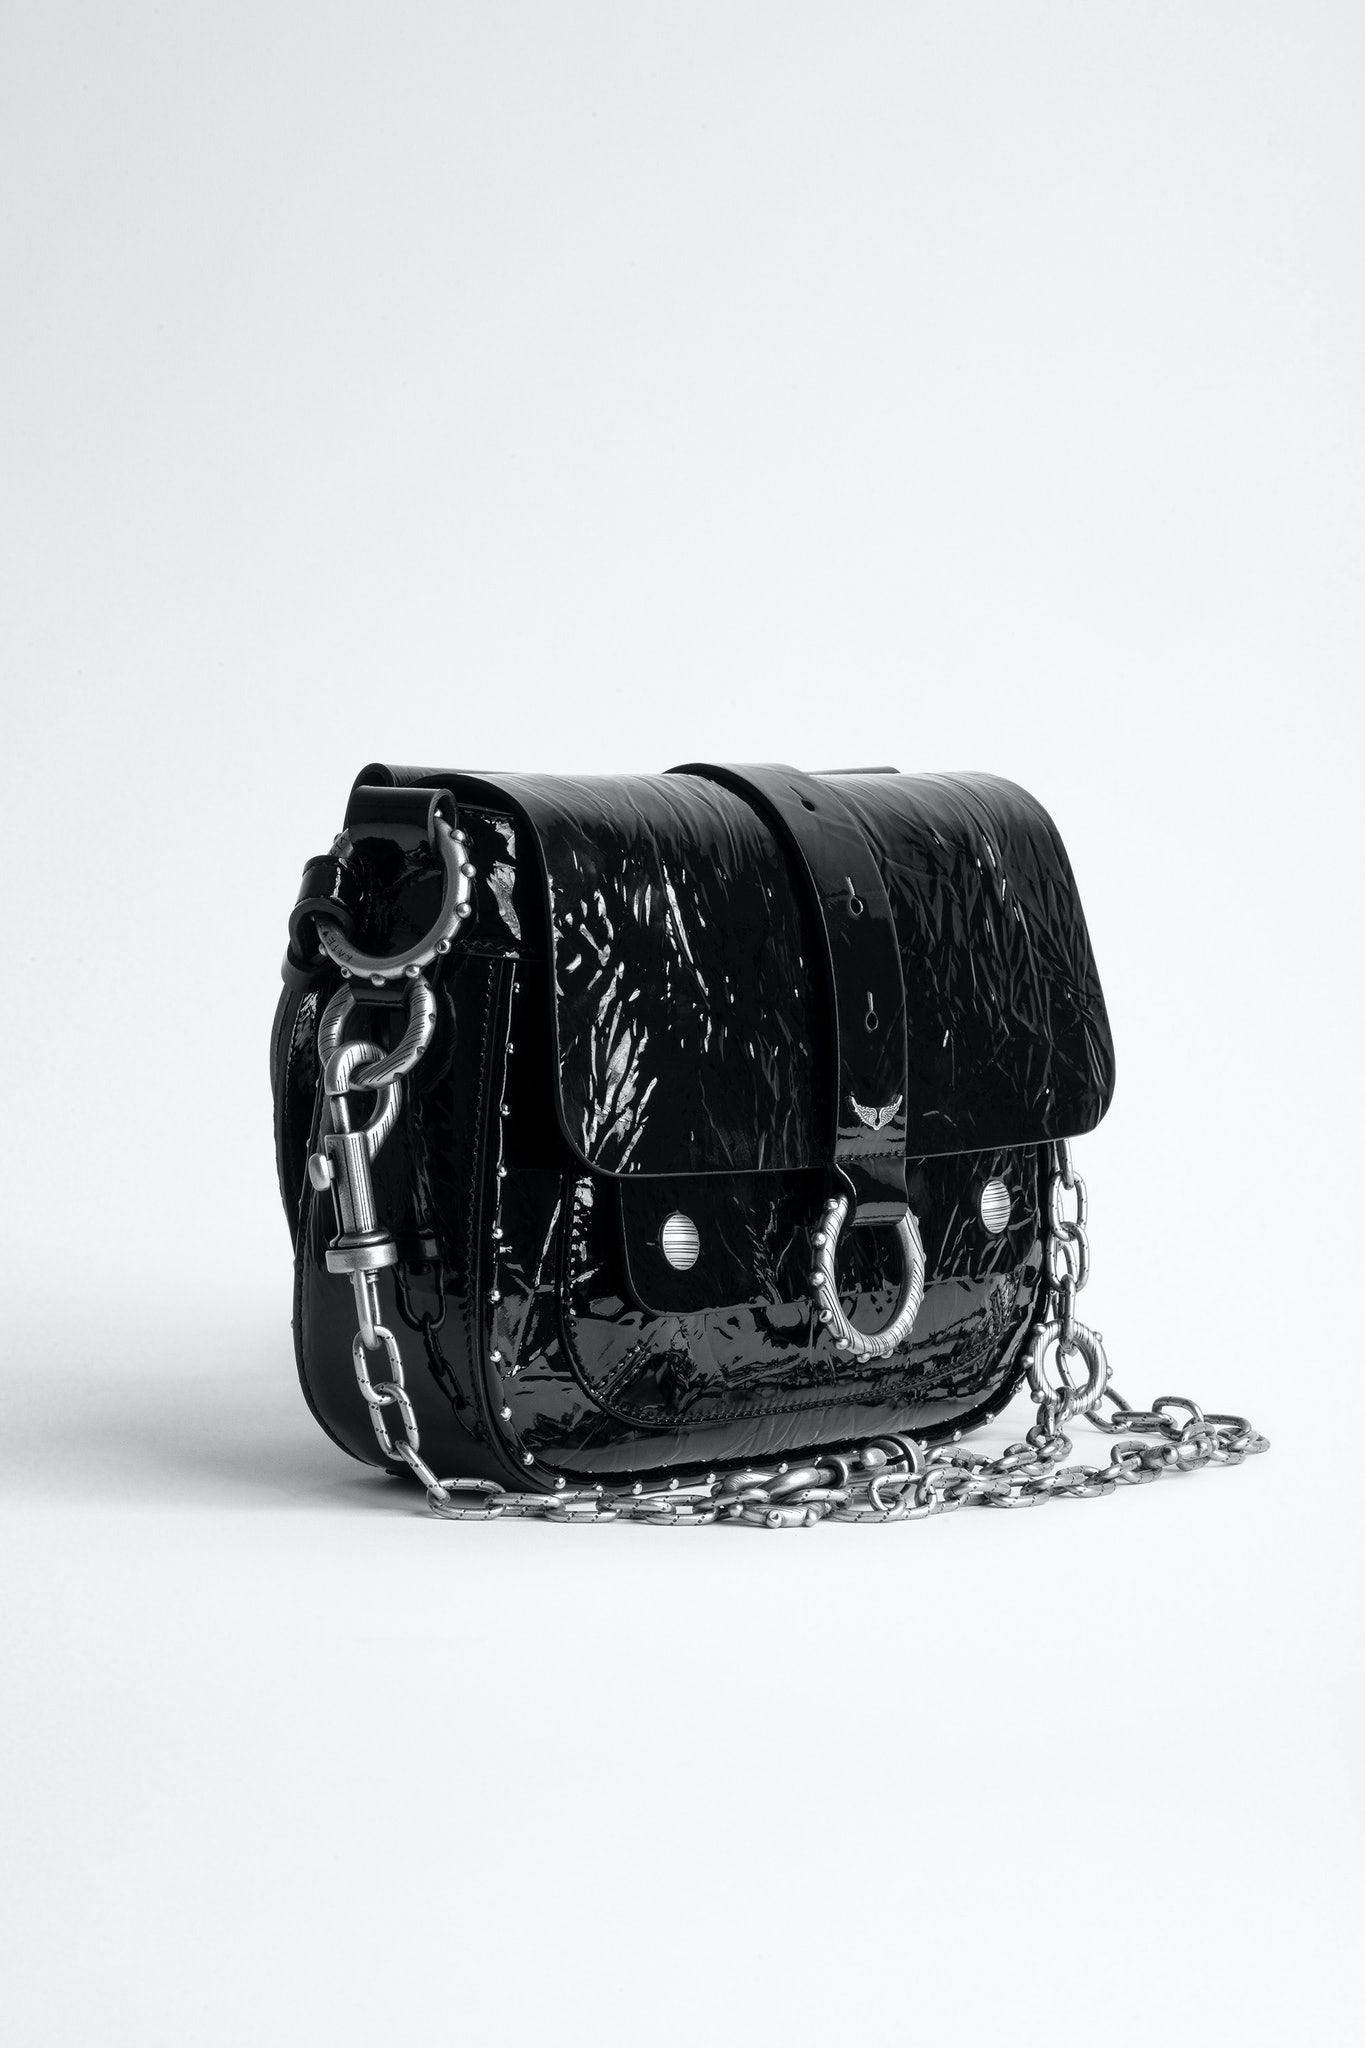 Kate Wrinkle bag